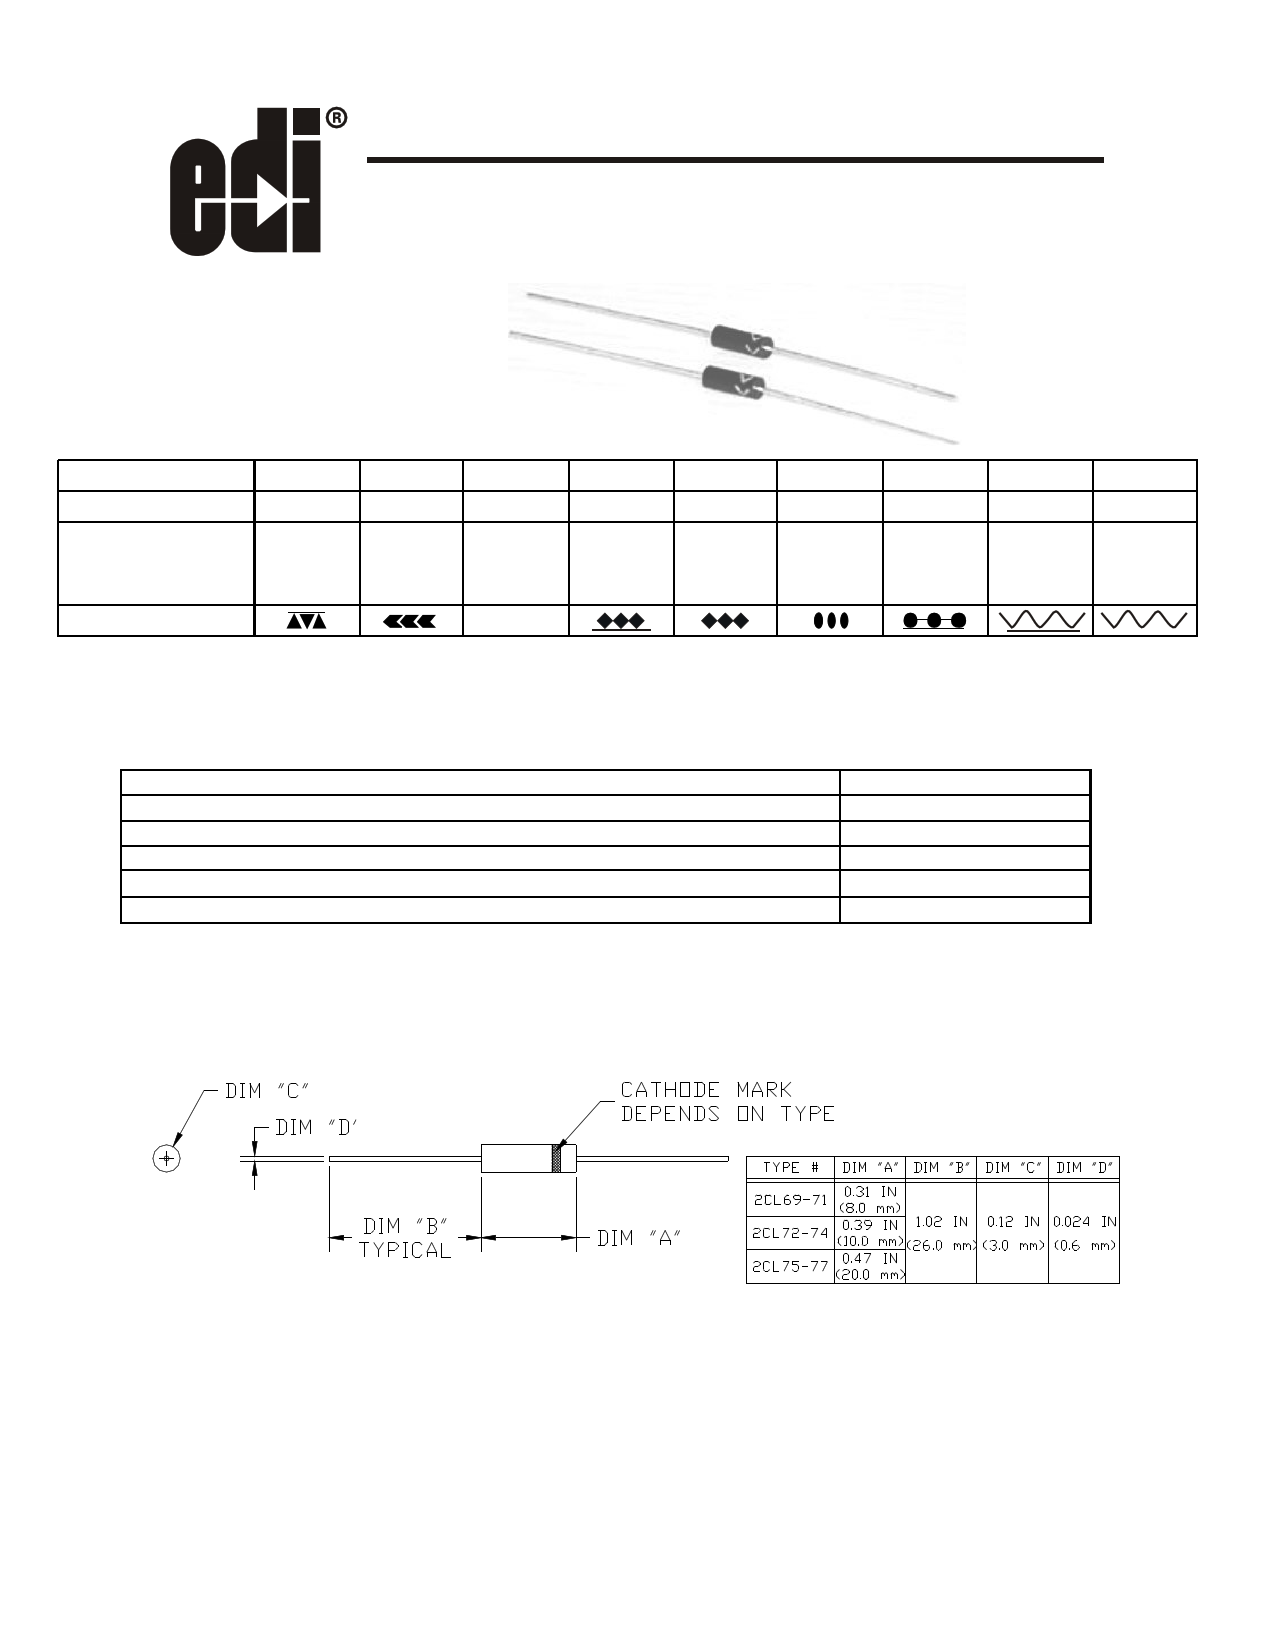 2CL69 datasheet